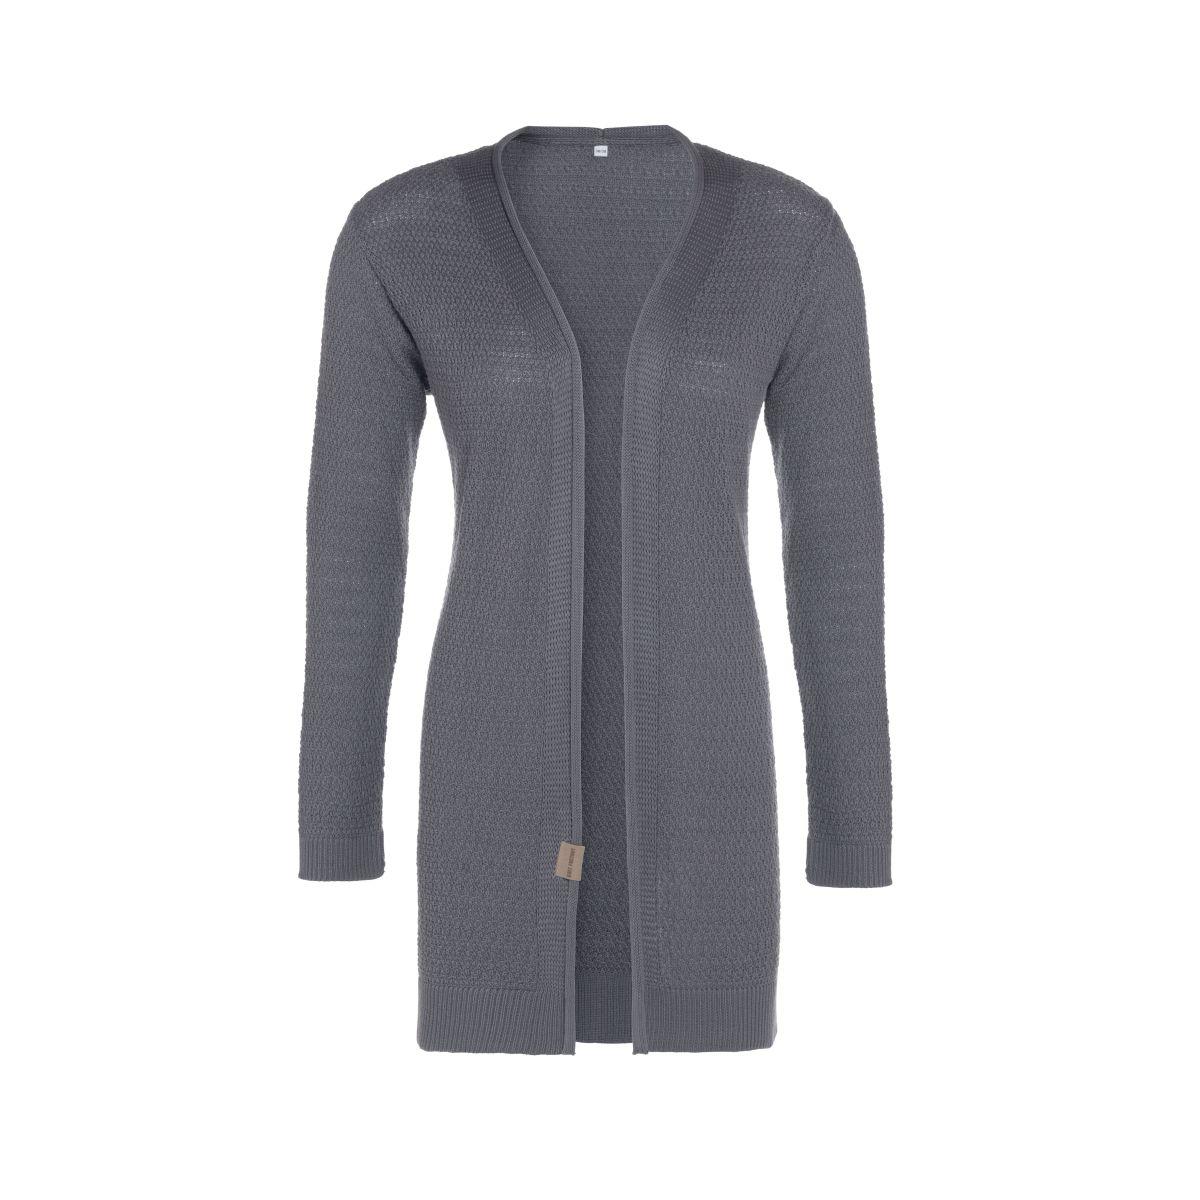 june knitted cardigan med grey 3638